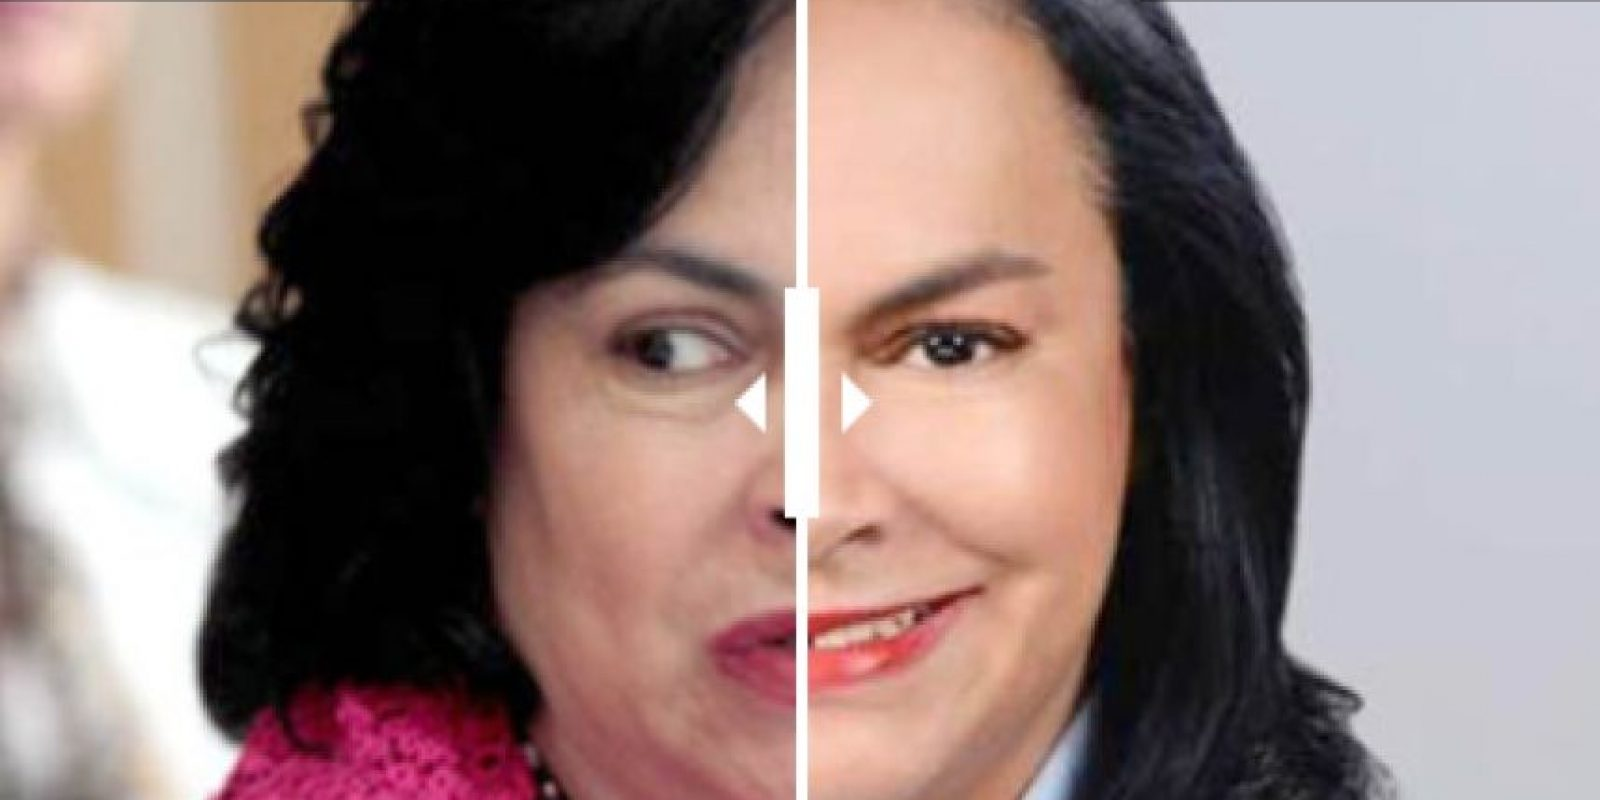 Margarita Saldaña Hernández, PAN Foto:Tomada de La Silla Rota